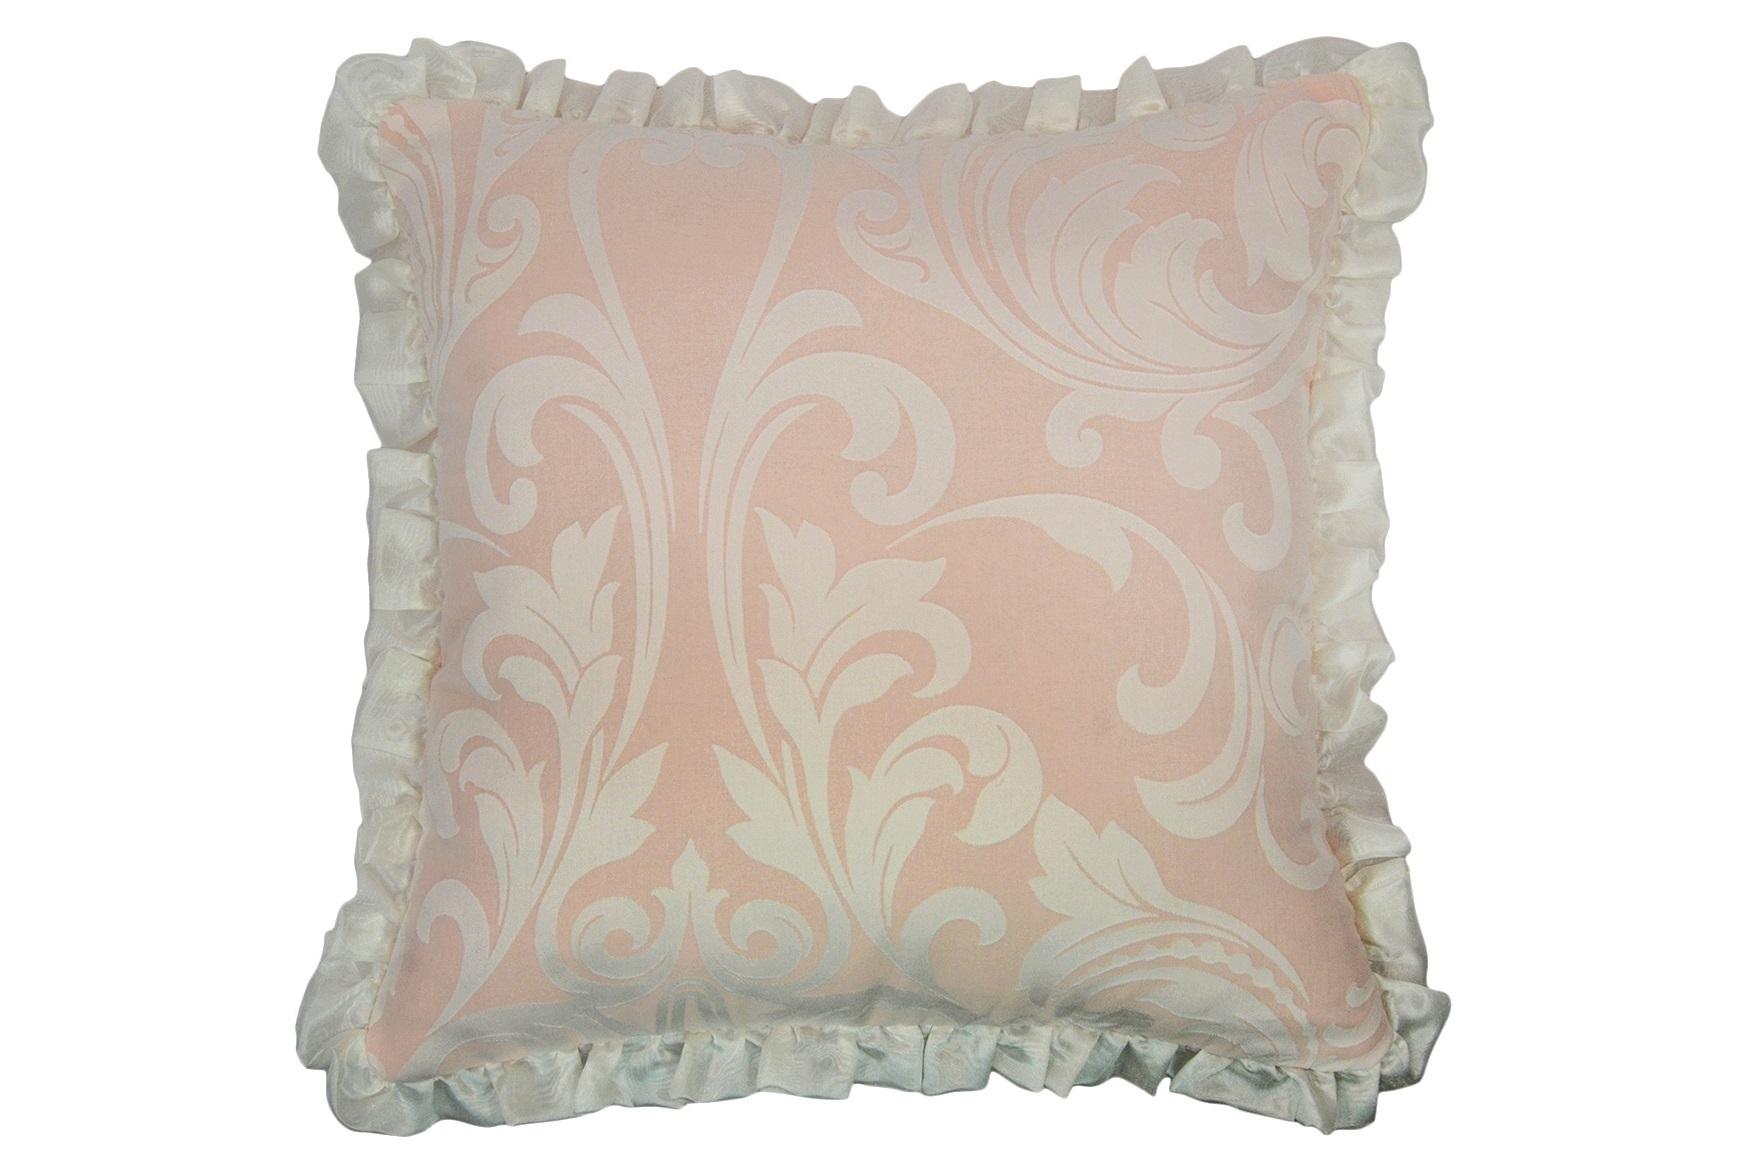 Подушка АрианаКвадратные подушки и наволочки<br>Декоративная  подушка .Чехол съемный.<br><br>Material: Вискоза<br>Ширина см: 45<br>Высота см: 45<br>Глубина см: 15